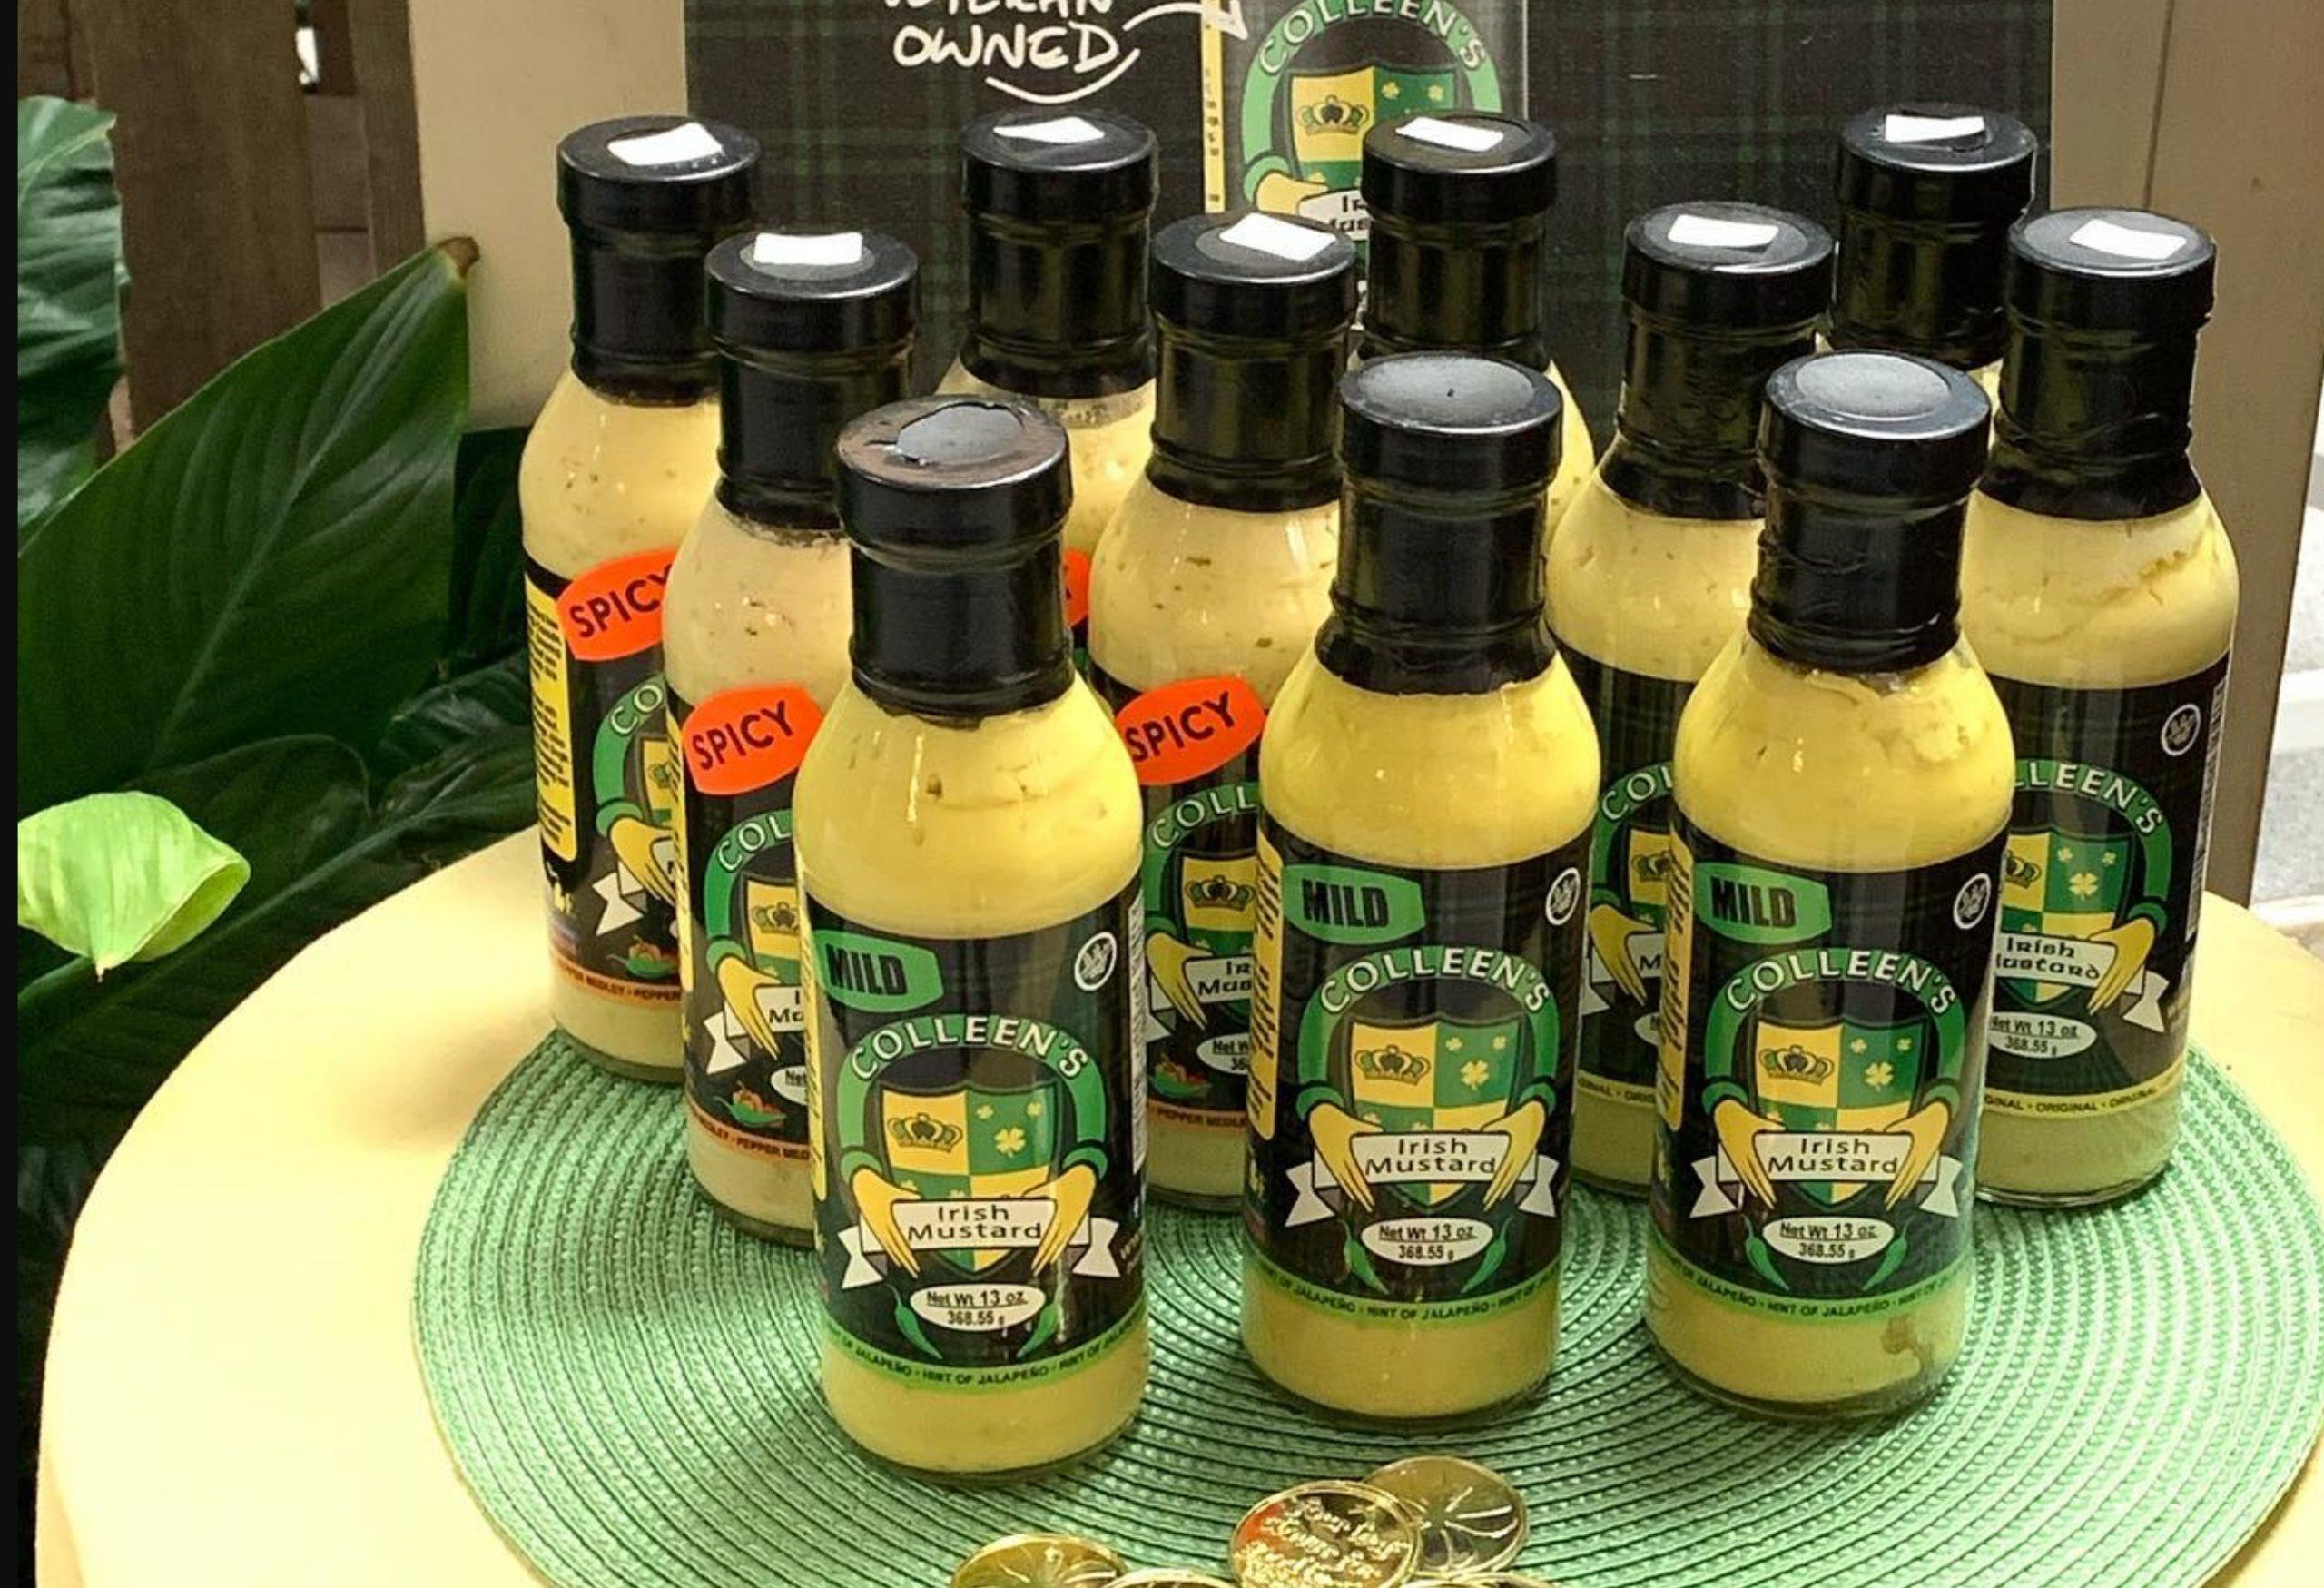 Colleens Irish Mustard - Mustard Label 05